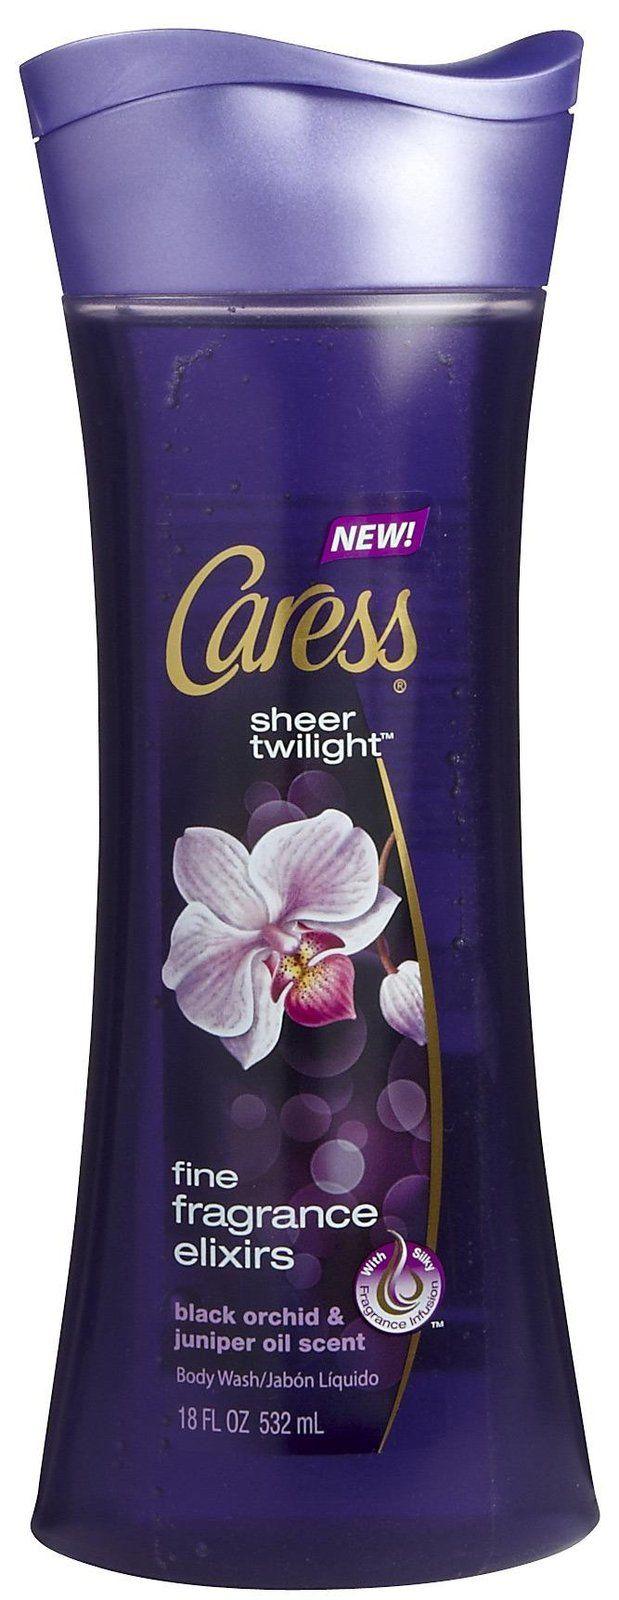 Caress Body Wash, Sheer Twilight Best Price Caress